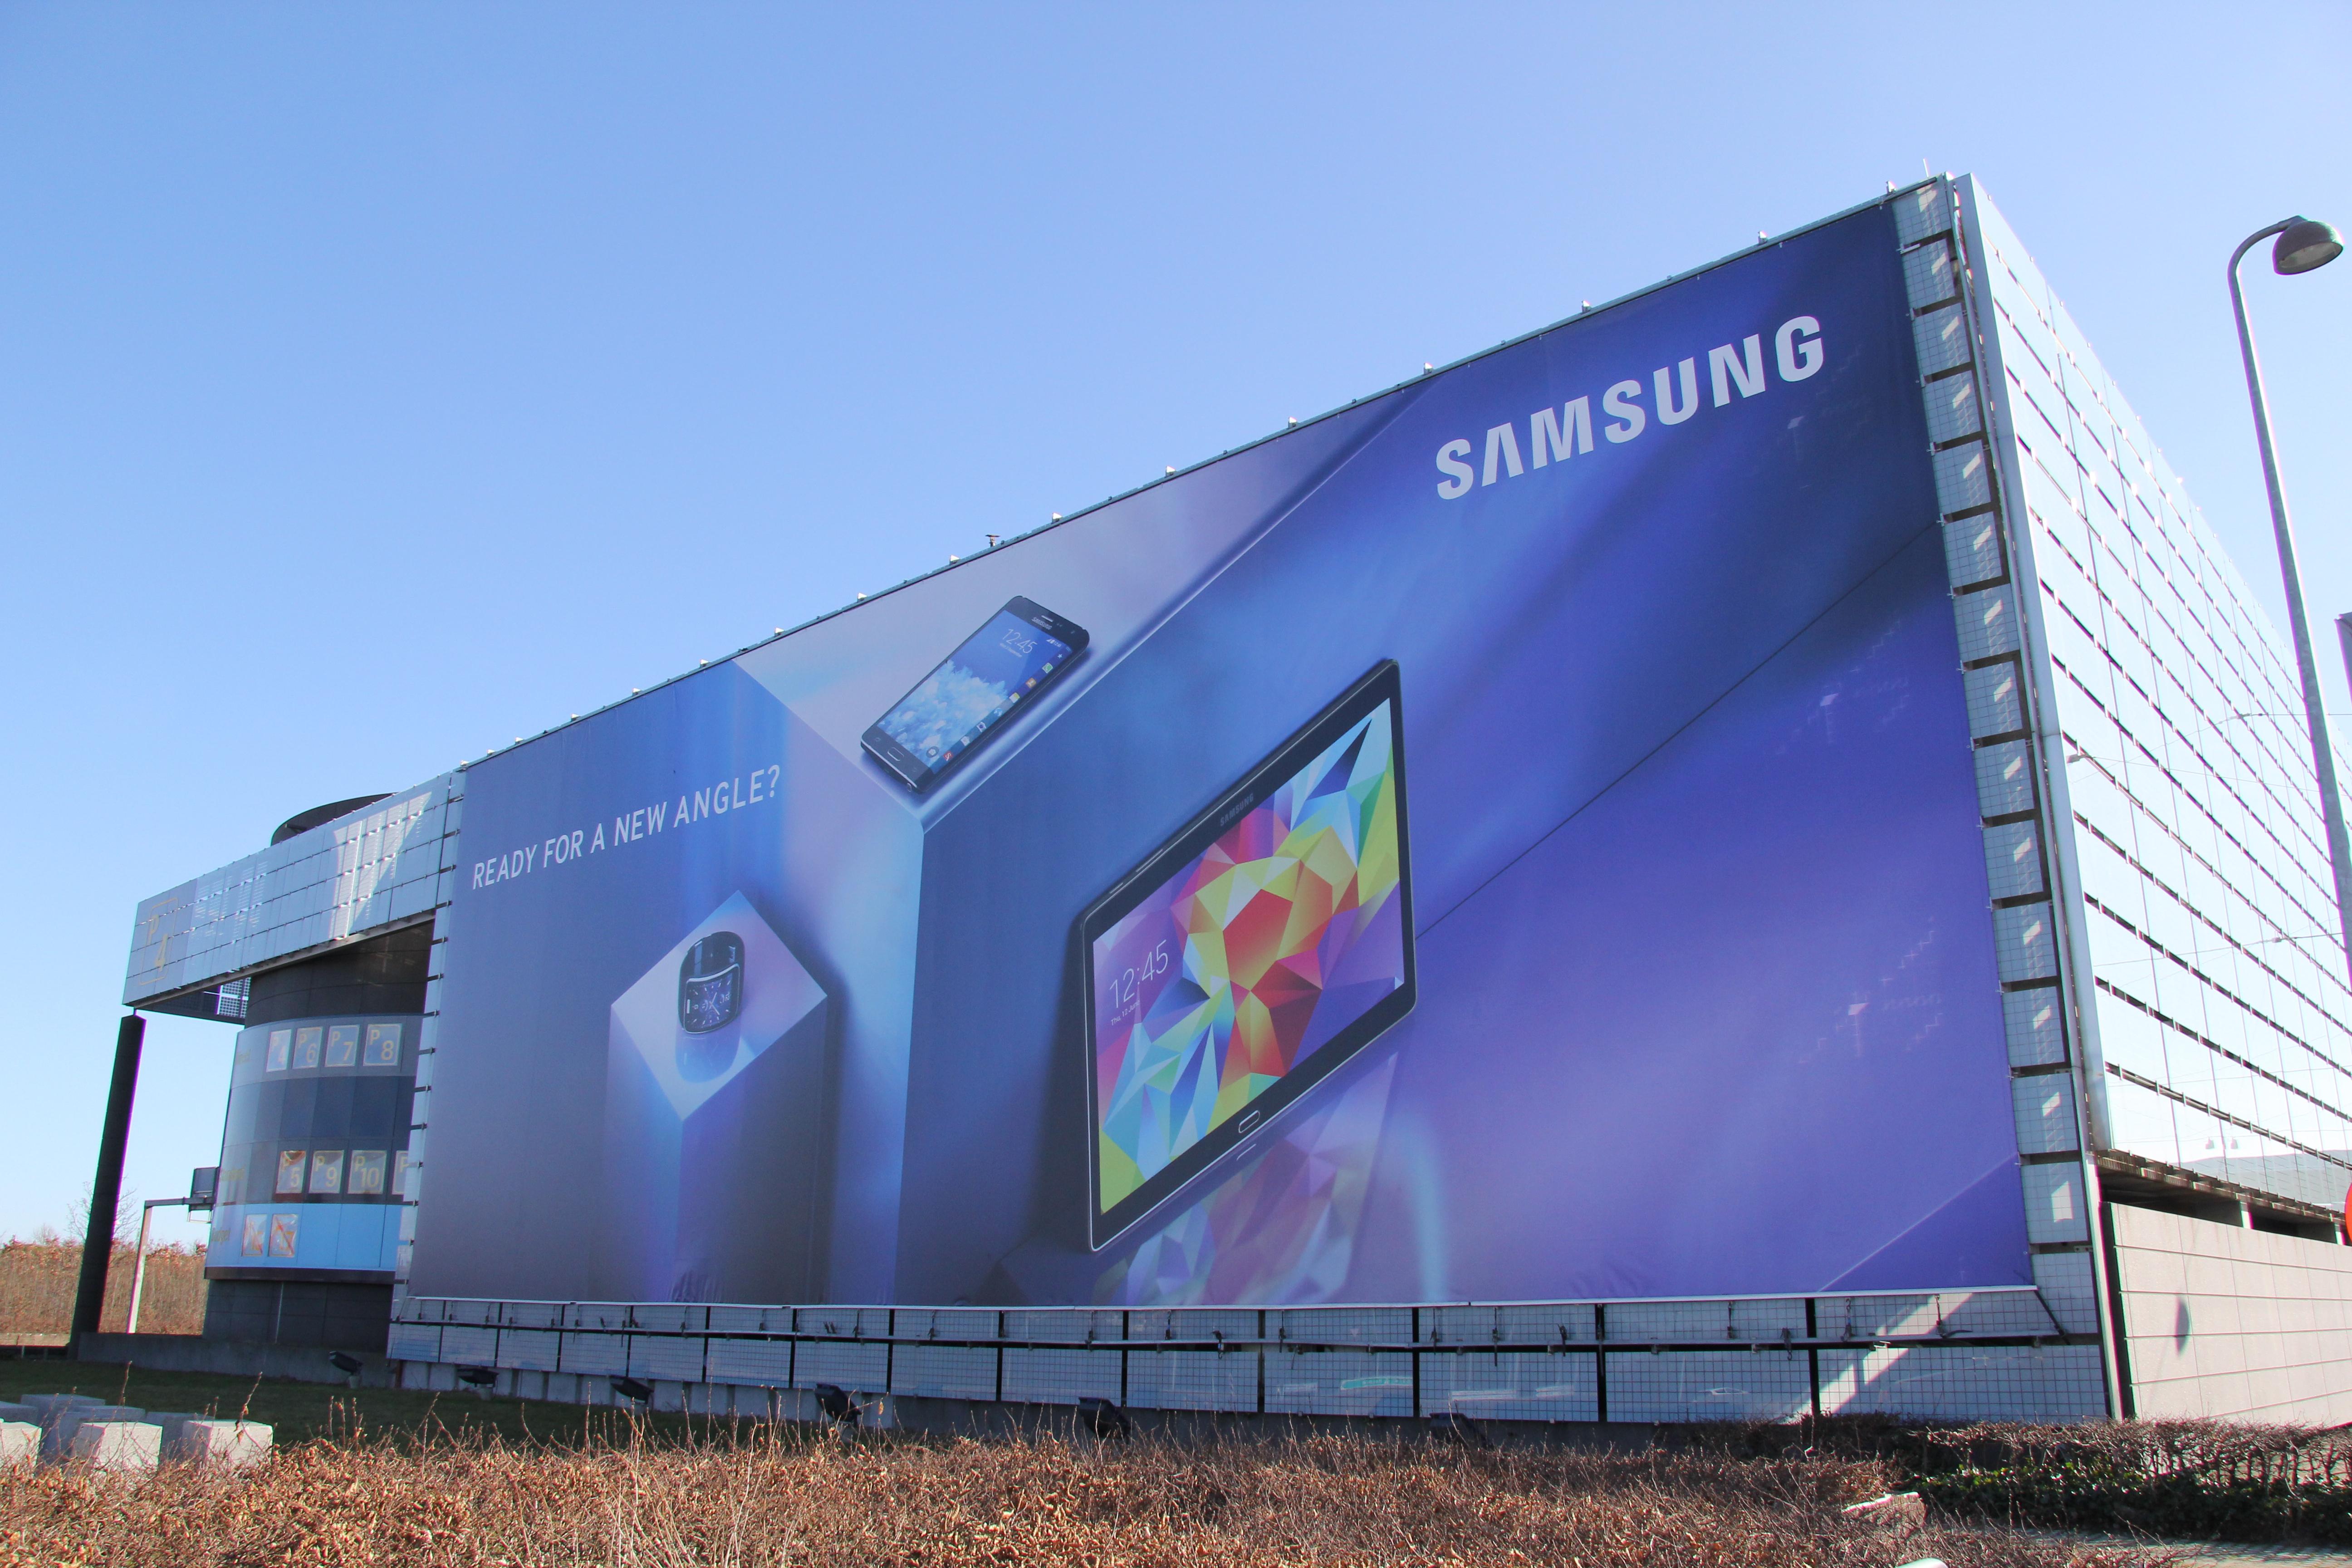 Samsung, Kbh. Lufthavn